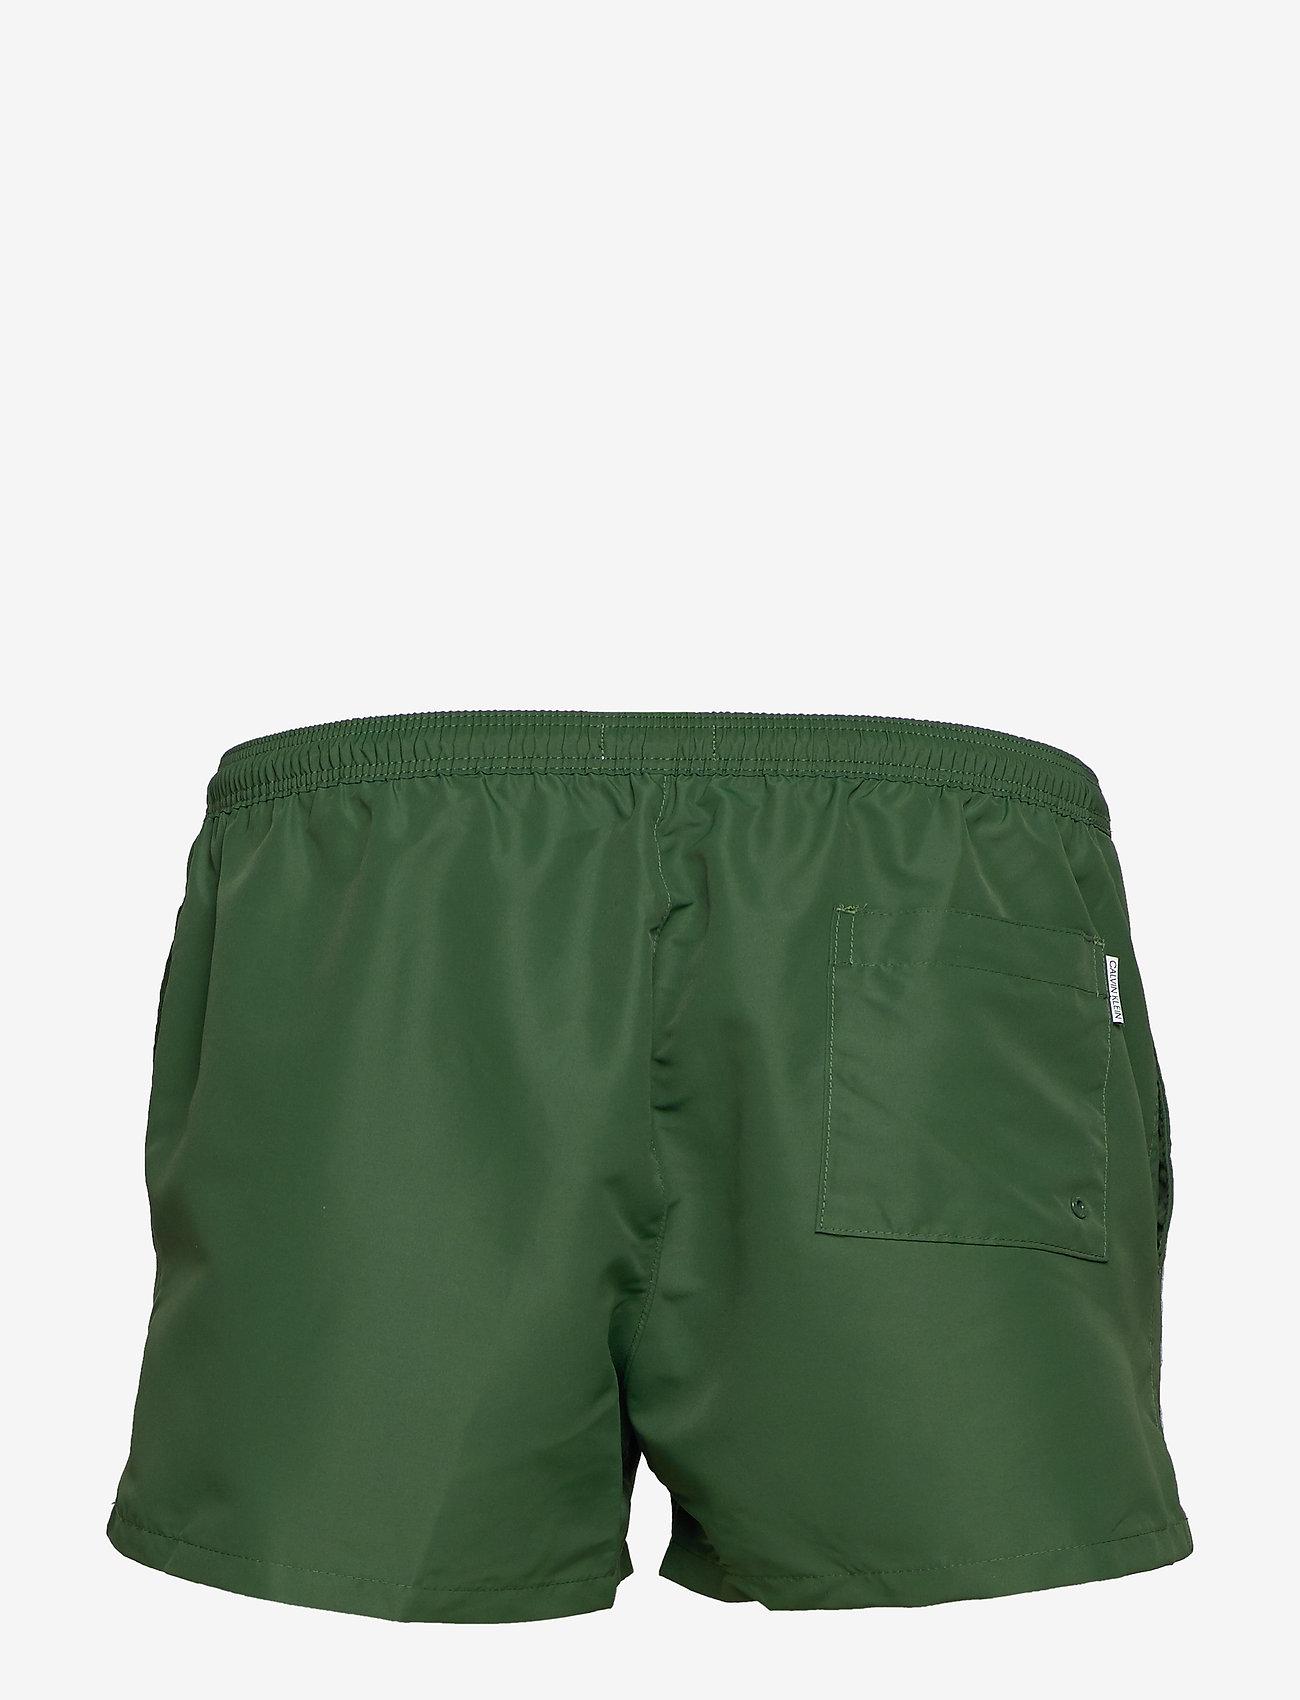 Calvin Klein - SHORT DRAWSTRING - badehosen - dark green - 1